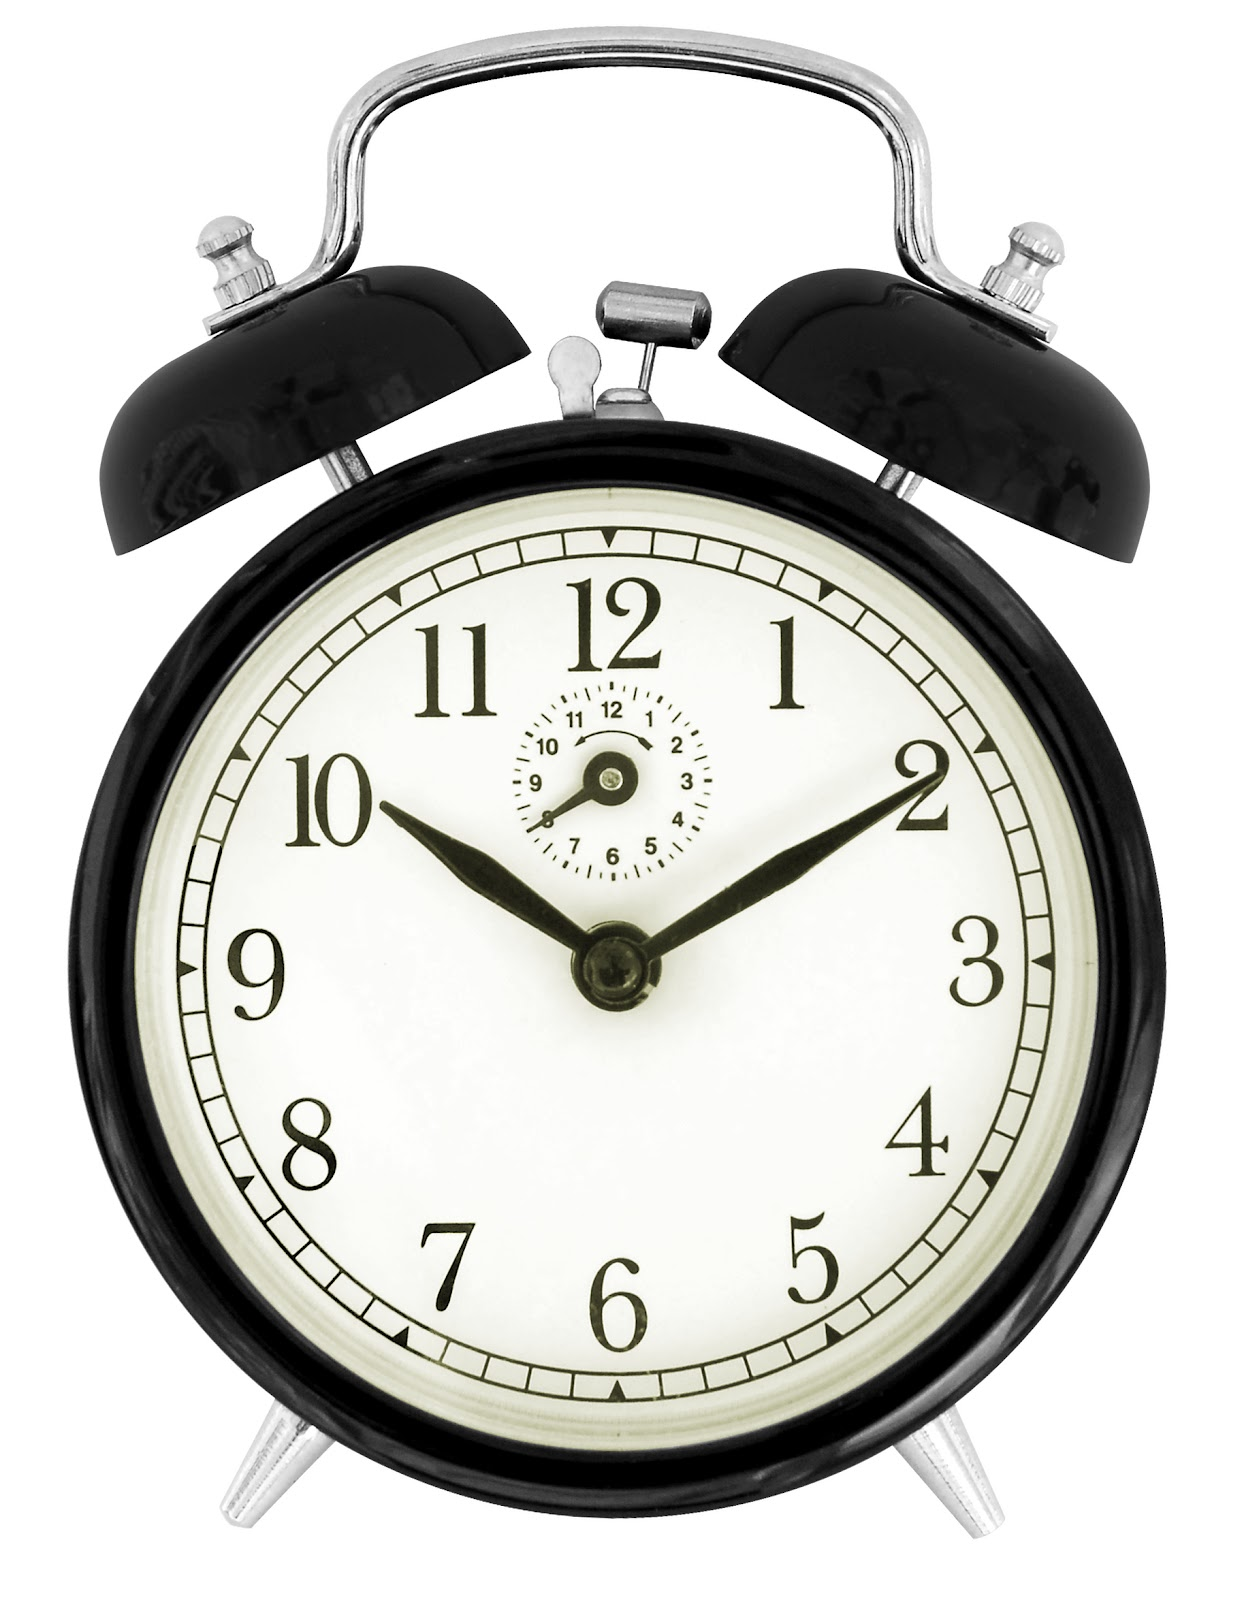 ... alarm clock face.jpg